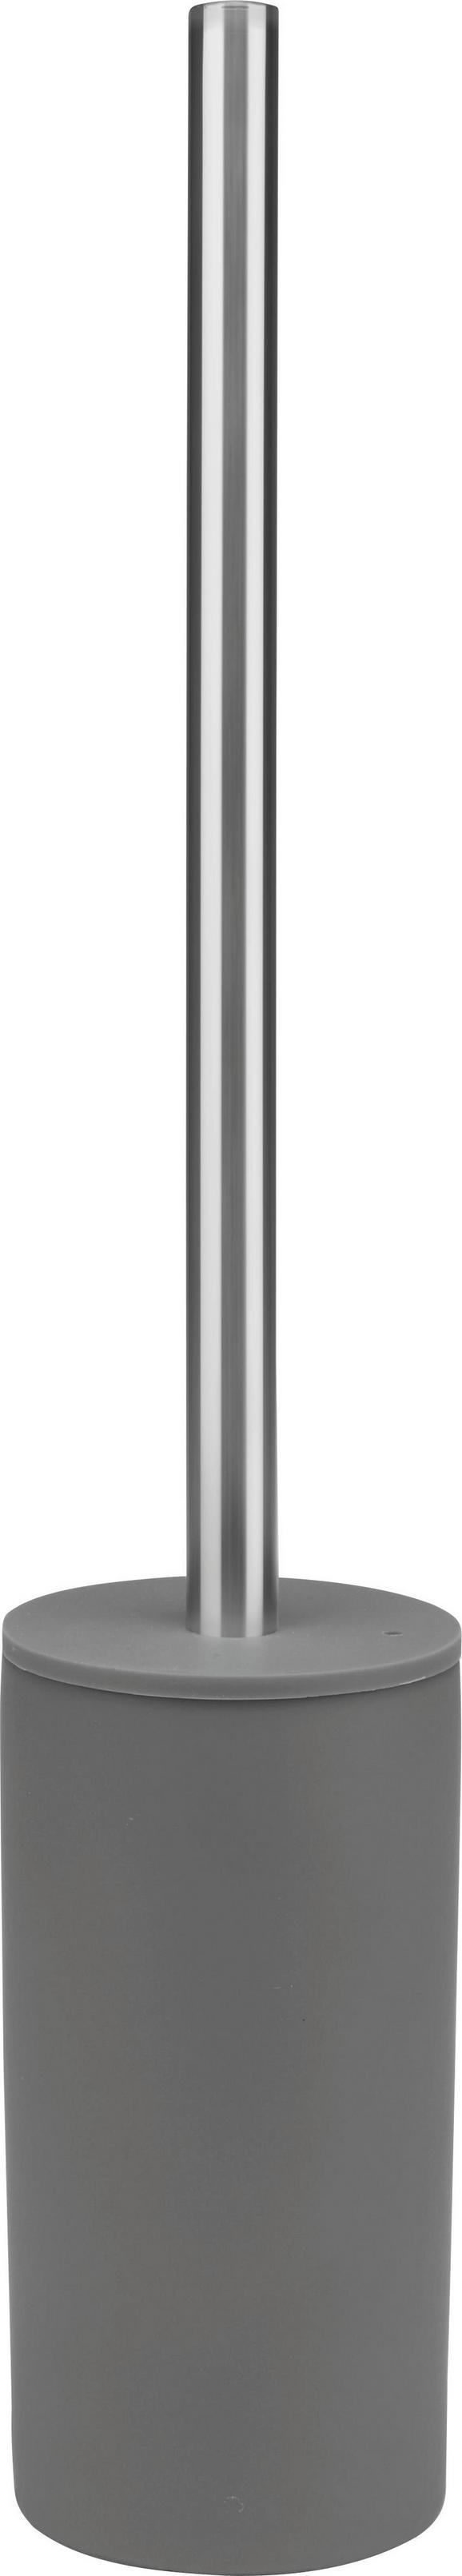 Wc-kefe Melanie - konvencionális, Műanyag/Fém (8/45cm) - Mömax modern living